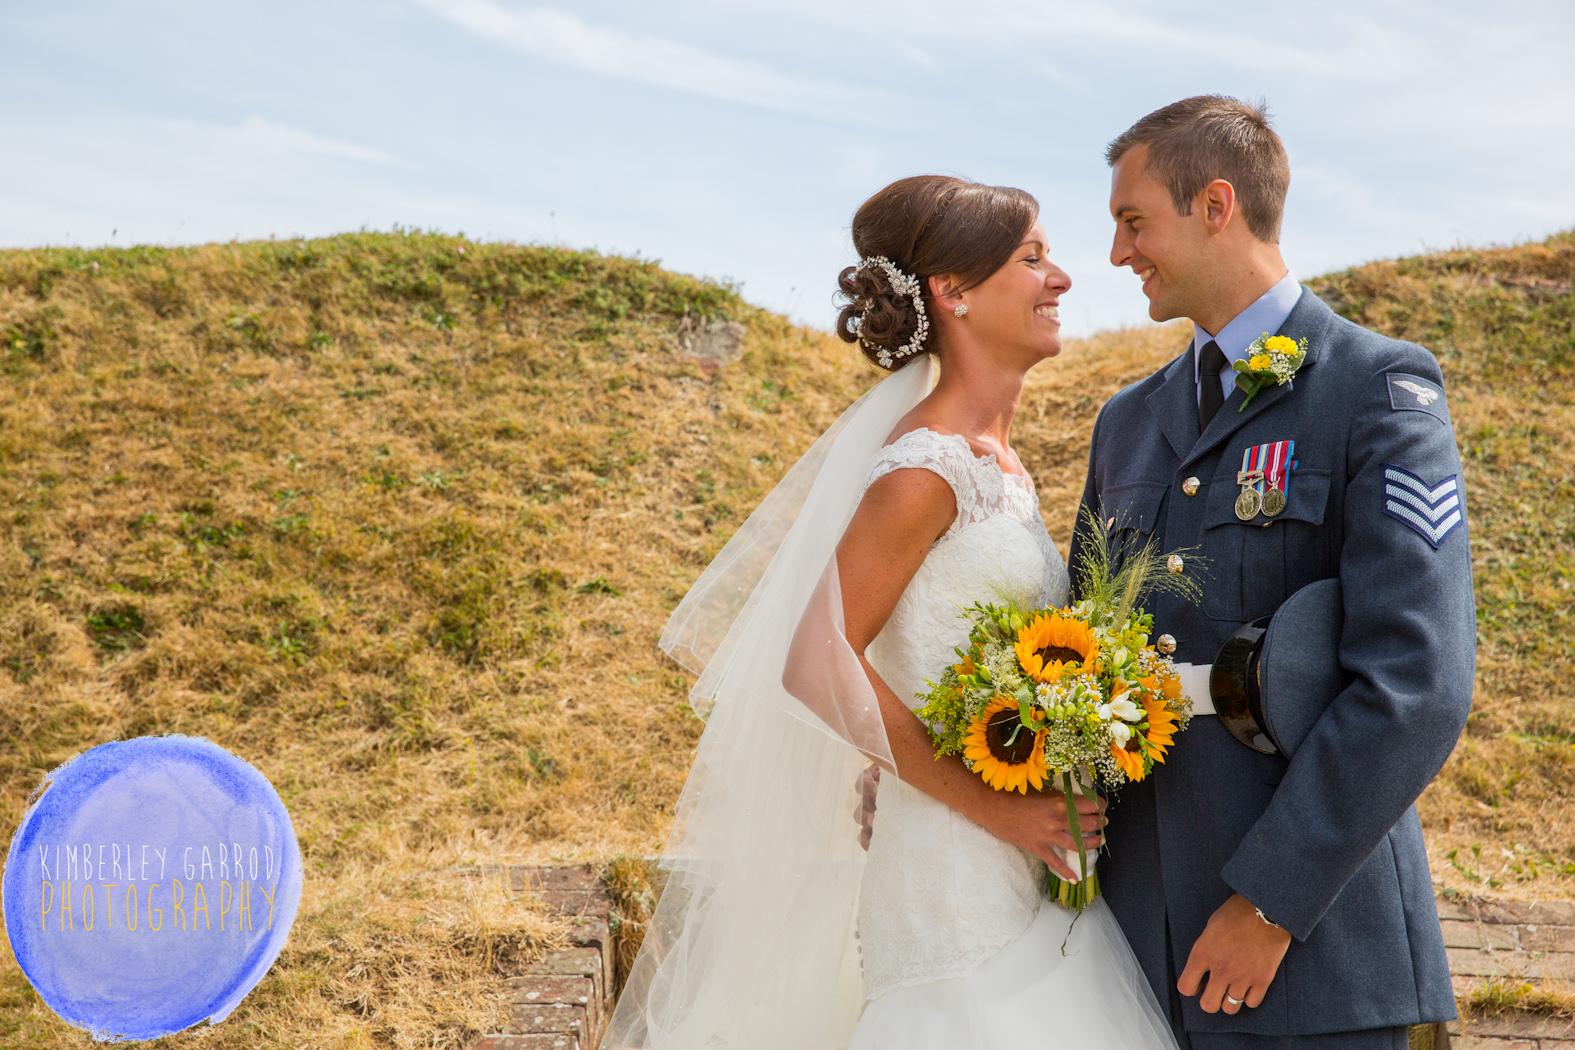 Royal Marines Museum Southsea Wedding Photographer Kimberley Garrod-9